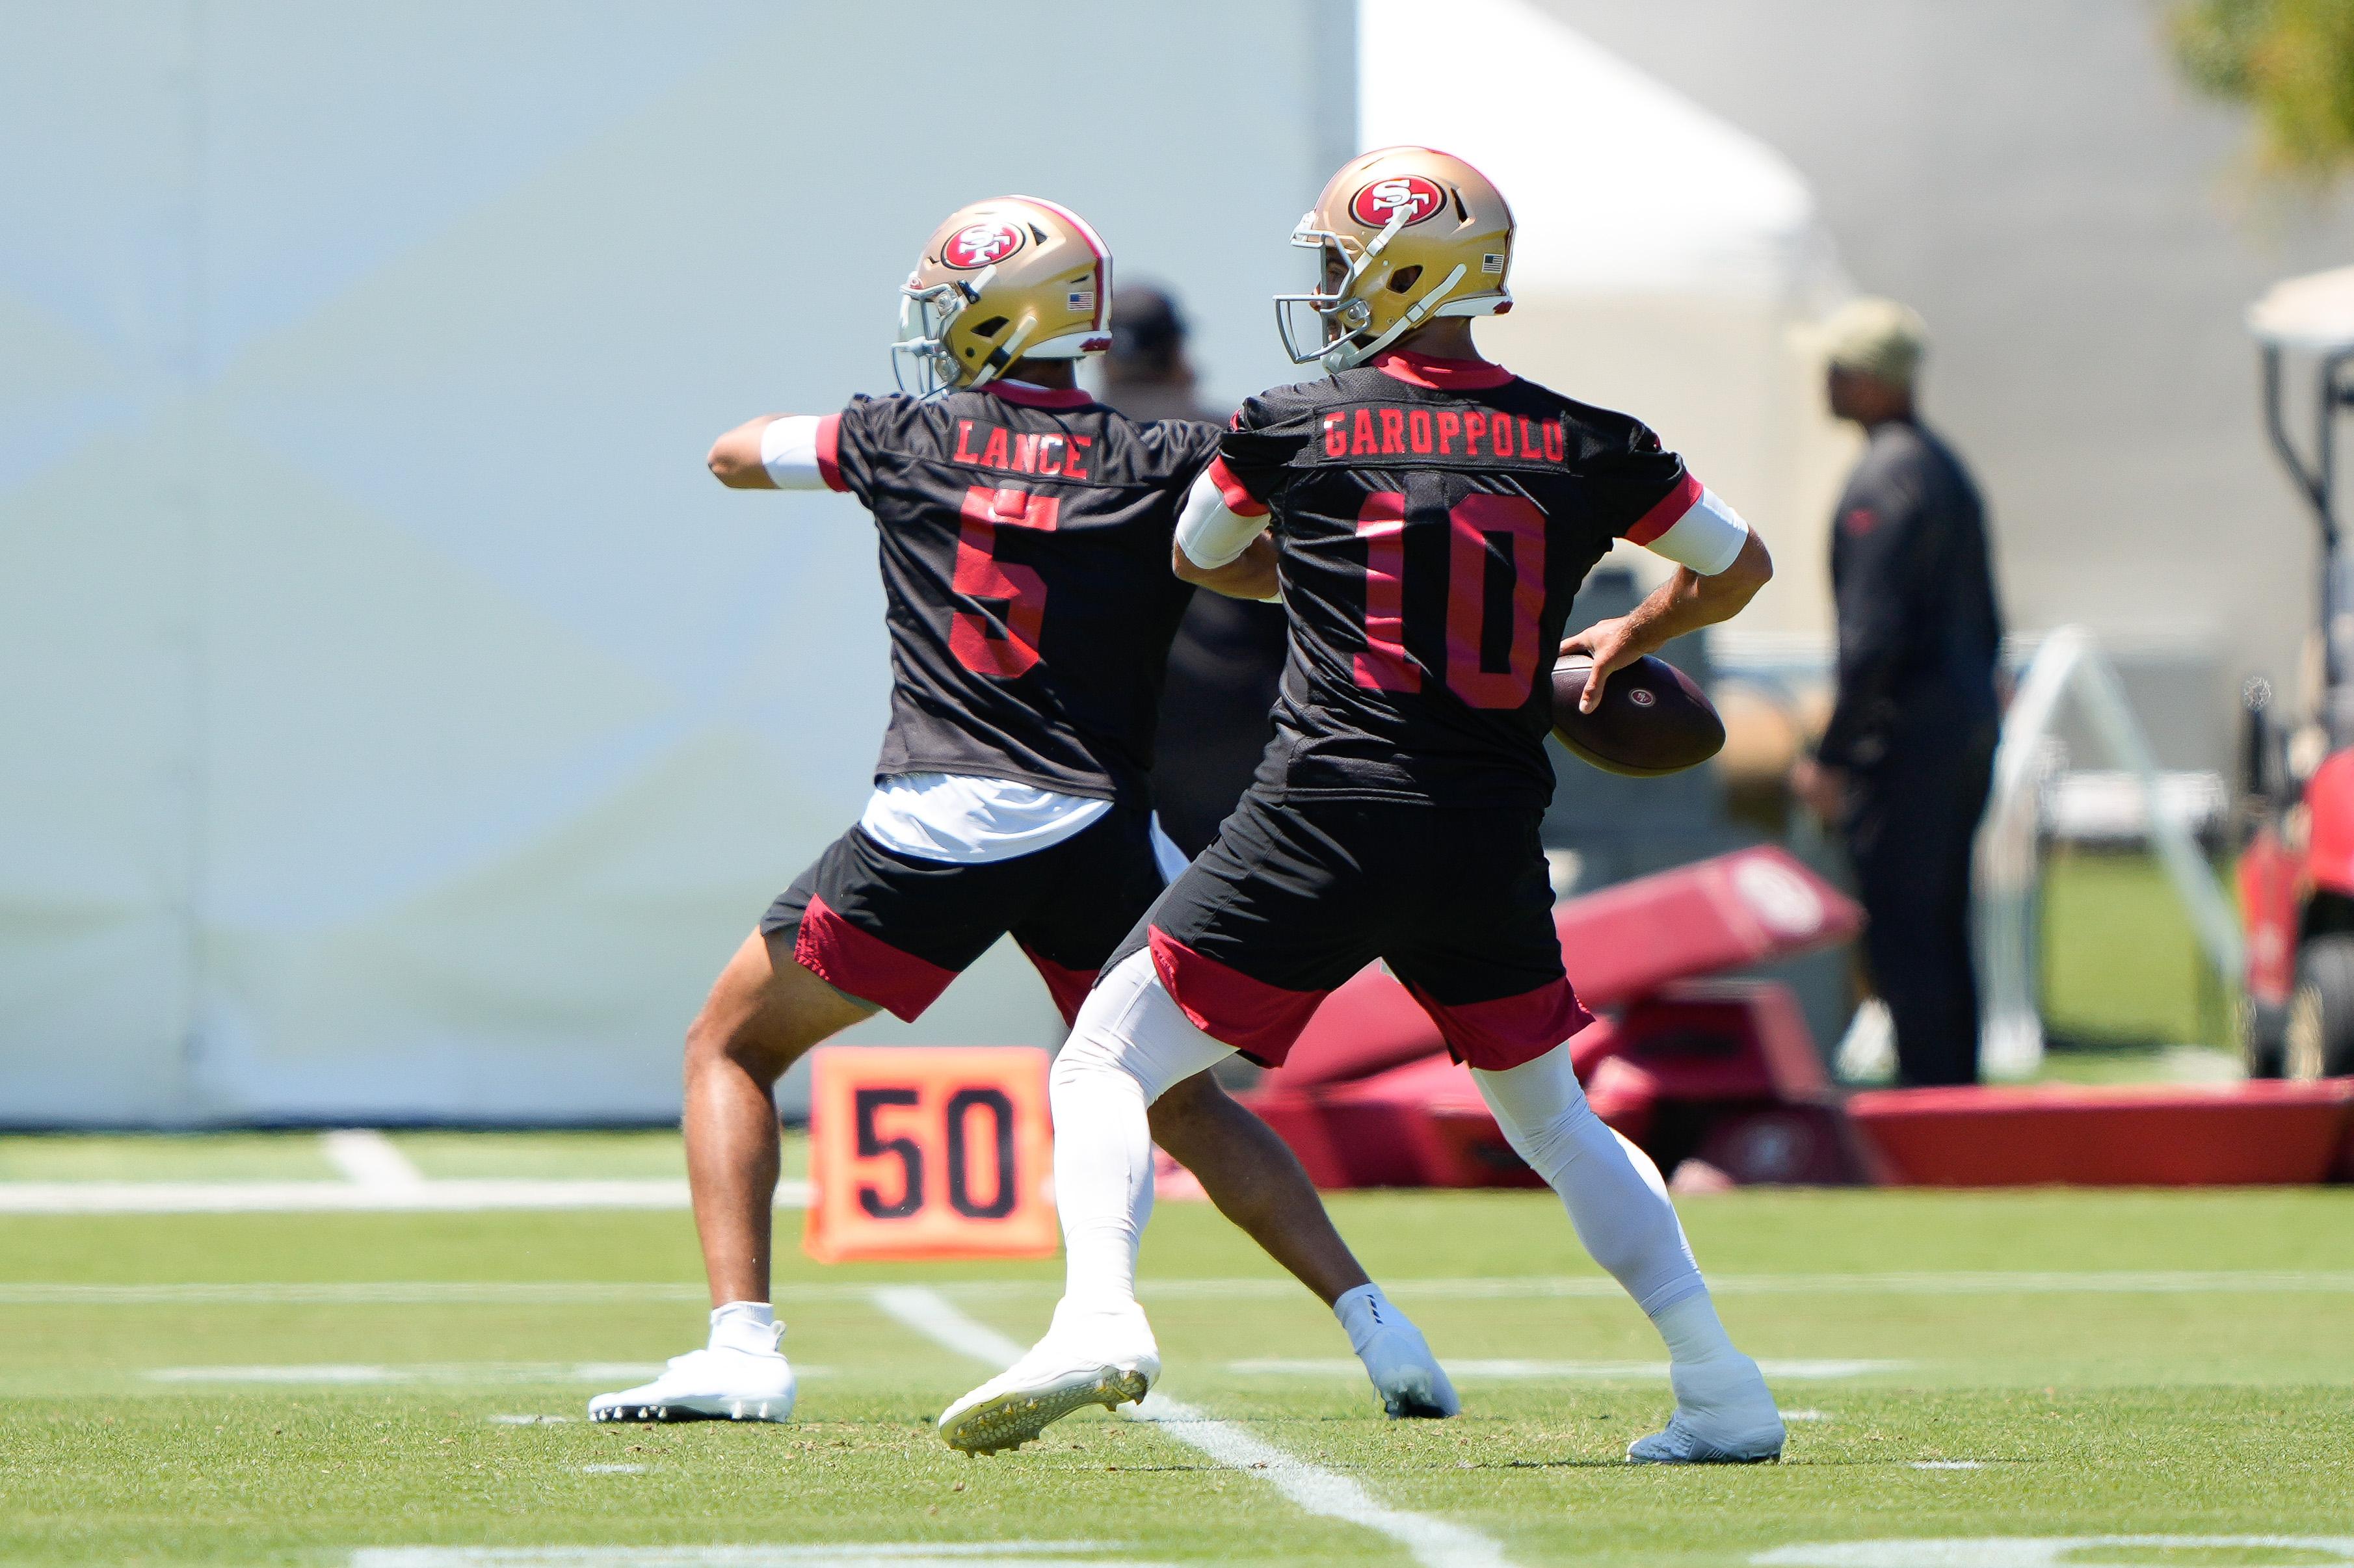 San Francisco 49ers quarterbacks Trey Lance (5) and Jimmy Garoppolo (10) throw the football during Organized Team Activities at San Francisco 49ers Training Facility.